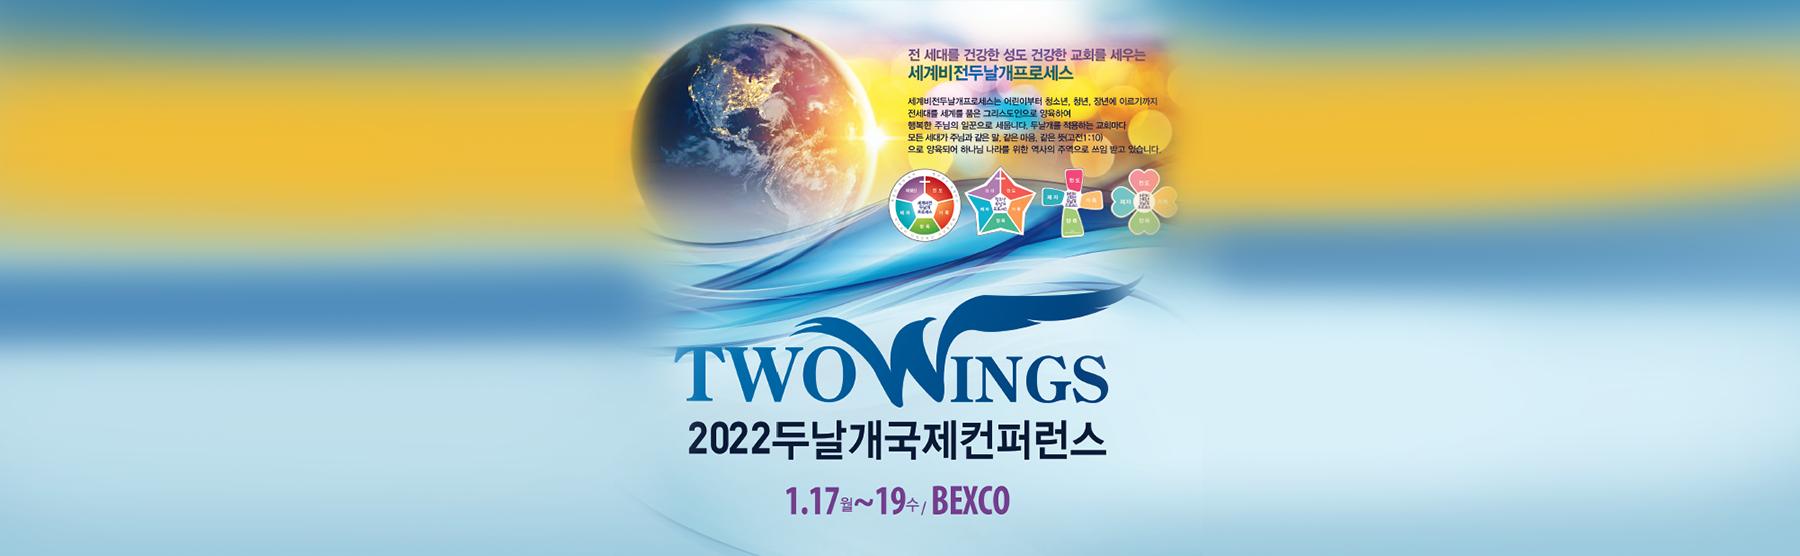 two-mbs-2022컨퍼런스